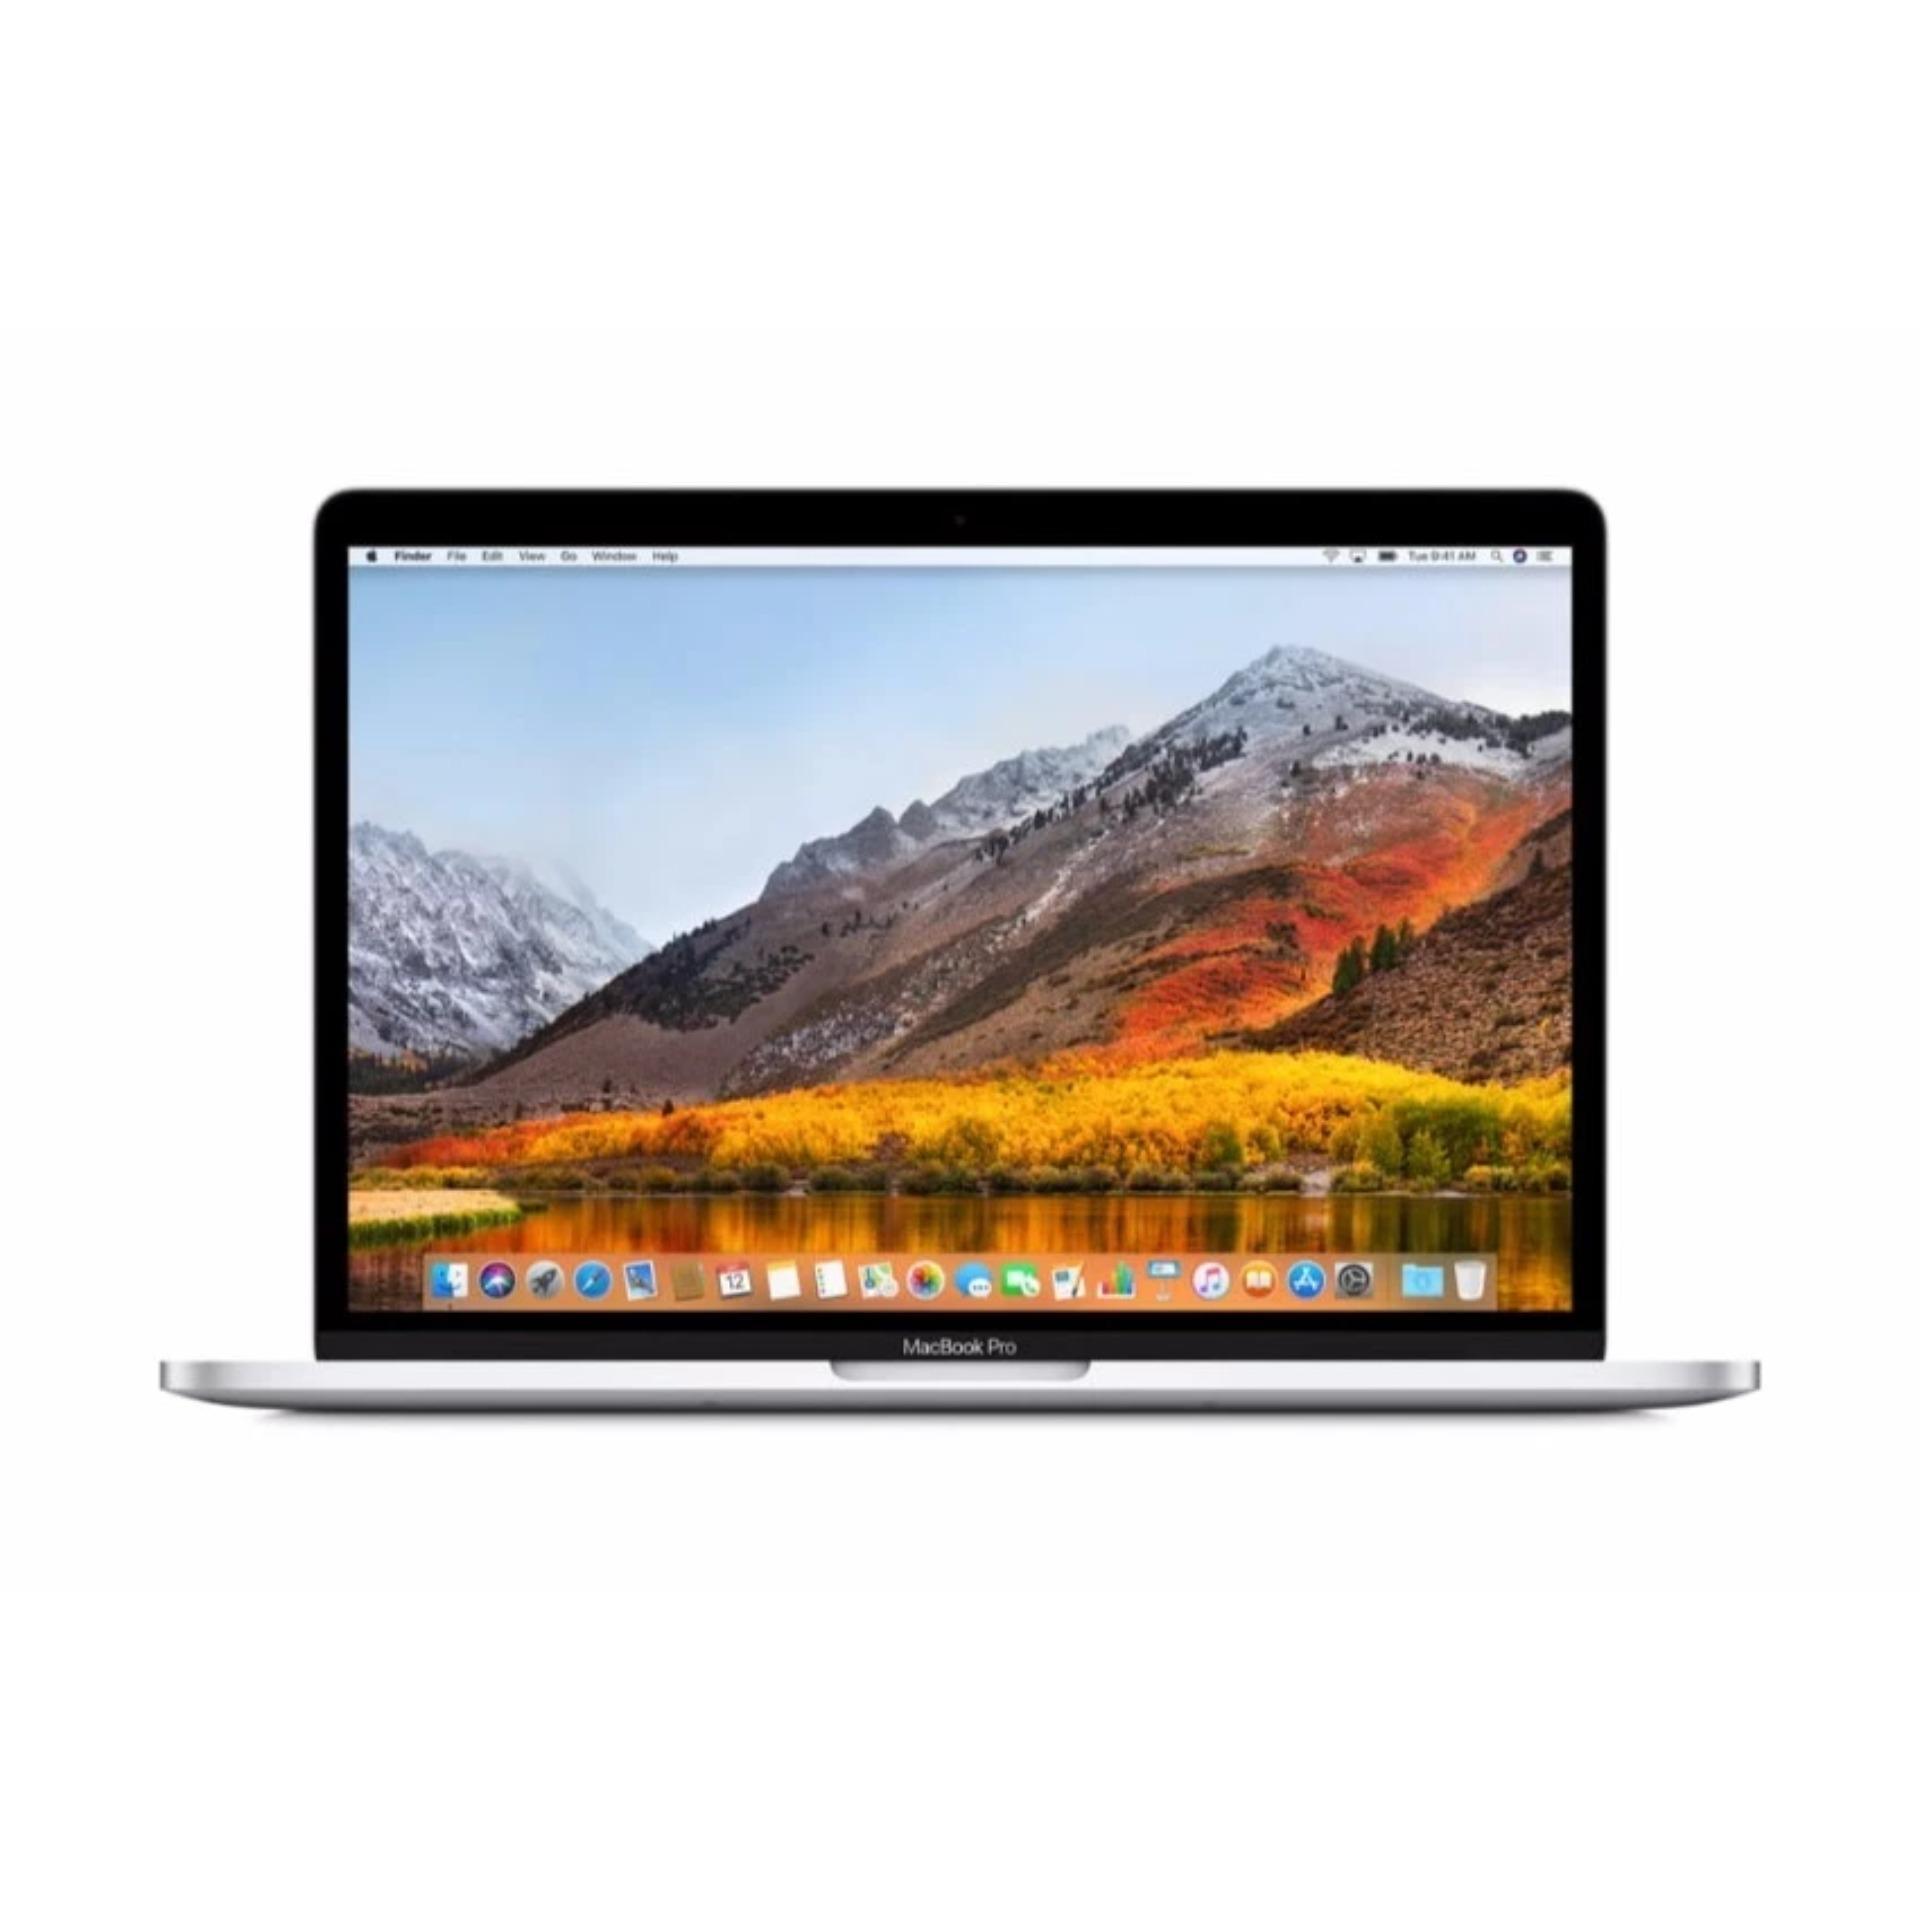 Apple MacBook Pro 13-inch: 2.3GHz dual-core i5, 256GB Silver